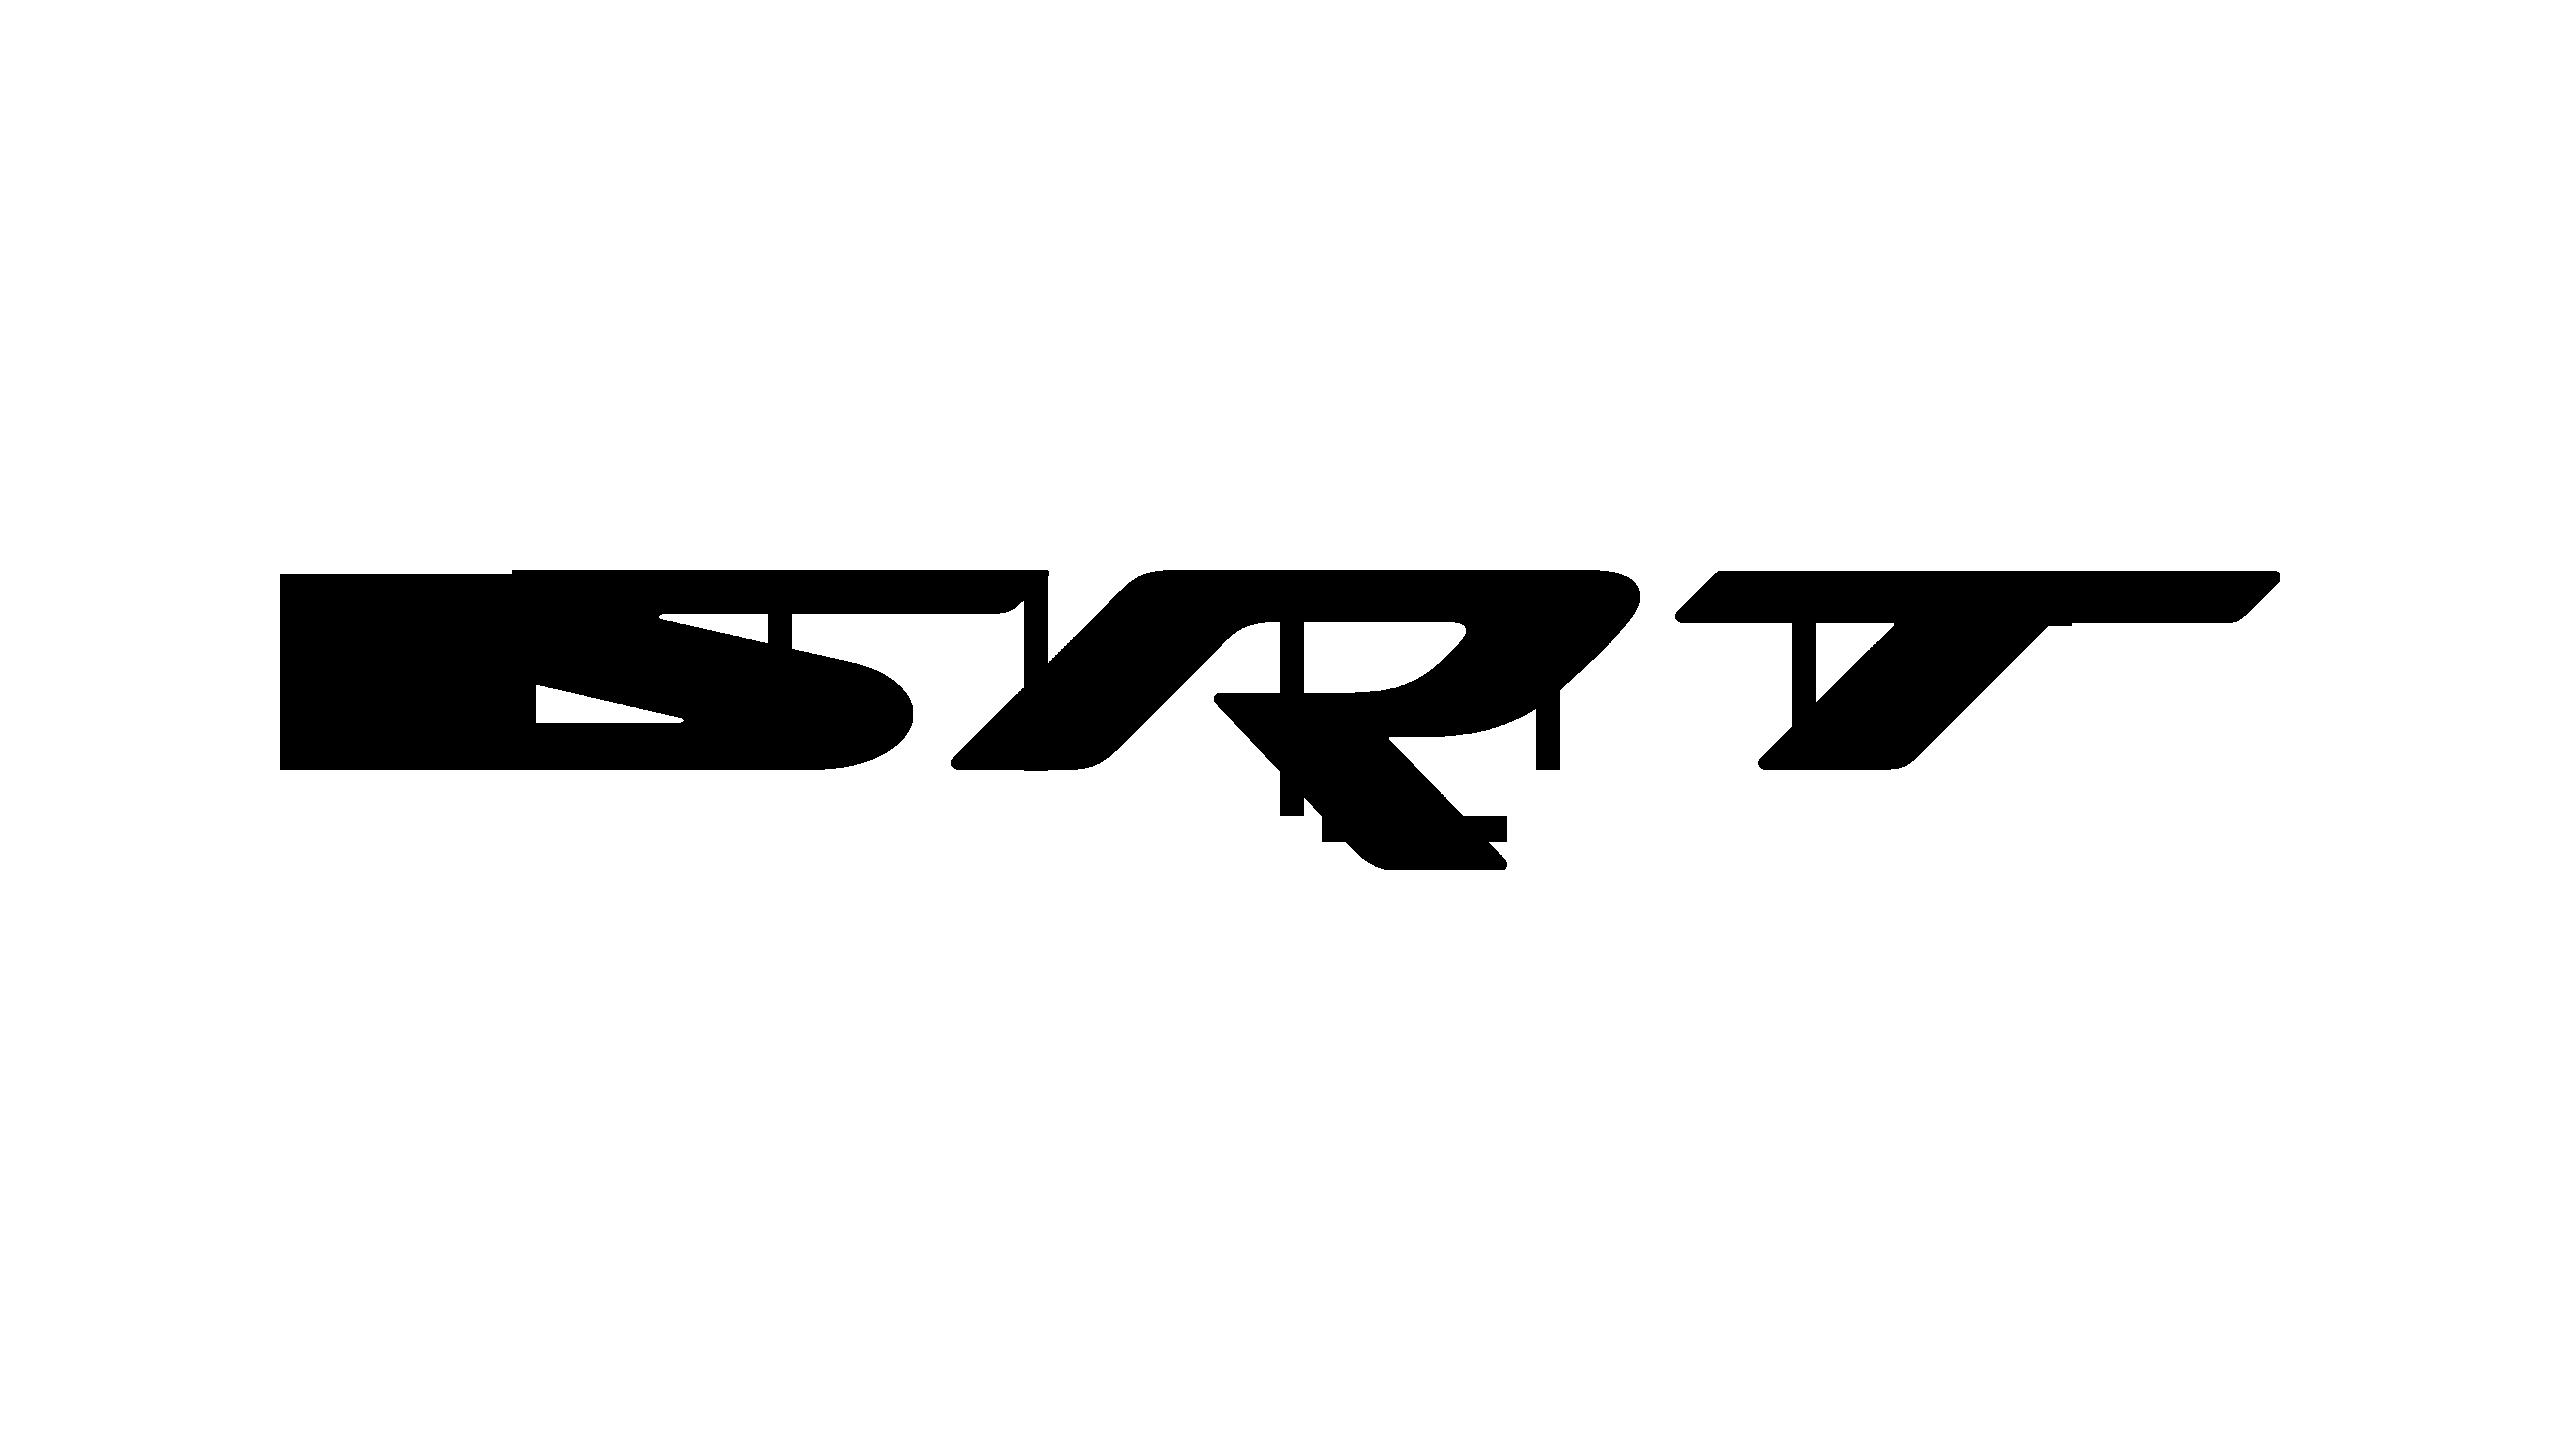 Dodge SRT Logo, Hellcat, Super Bee, HD Png, Information.